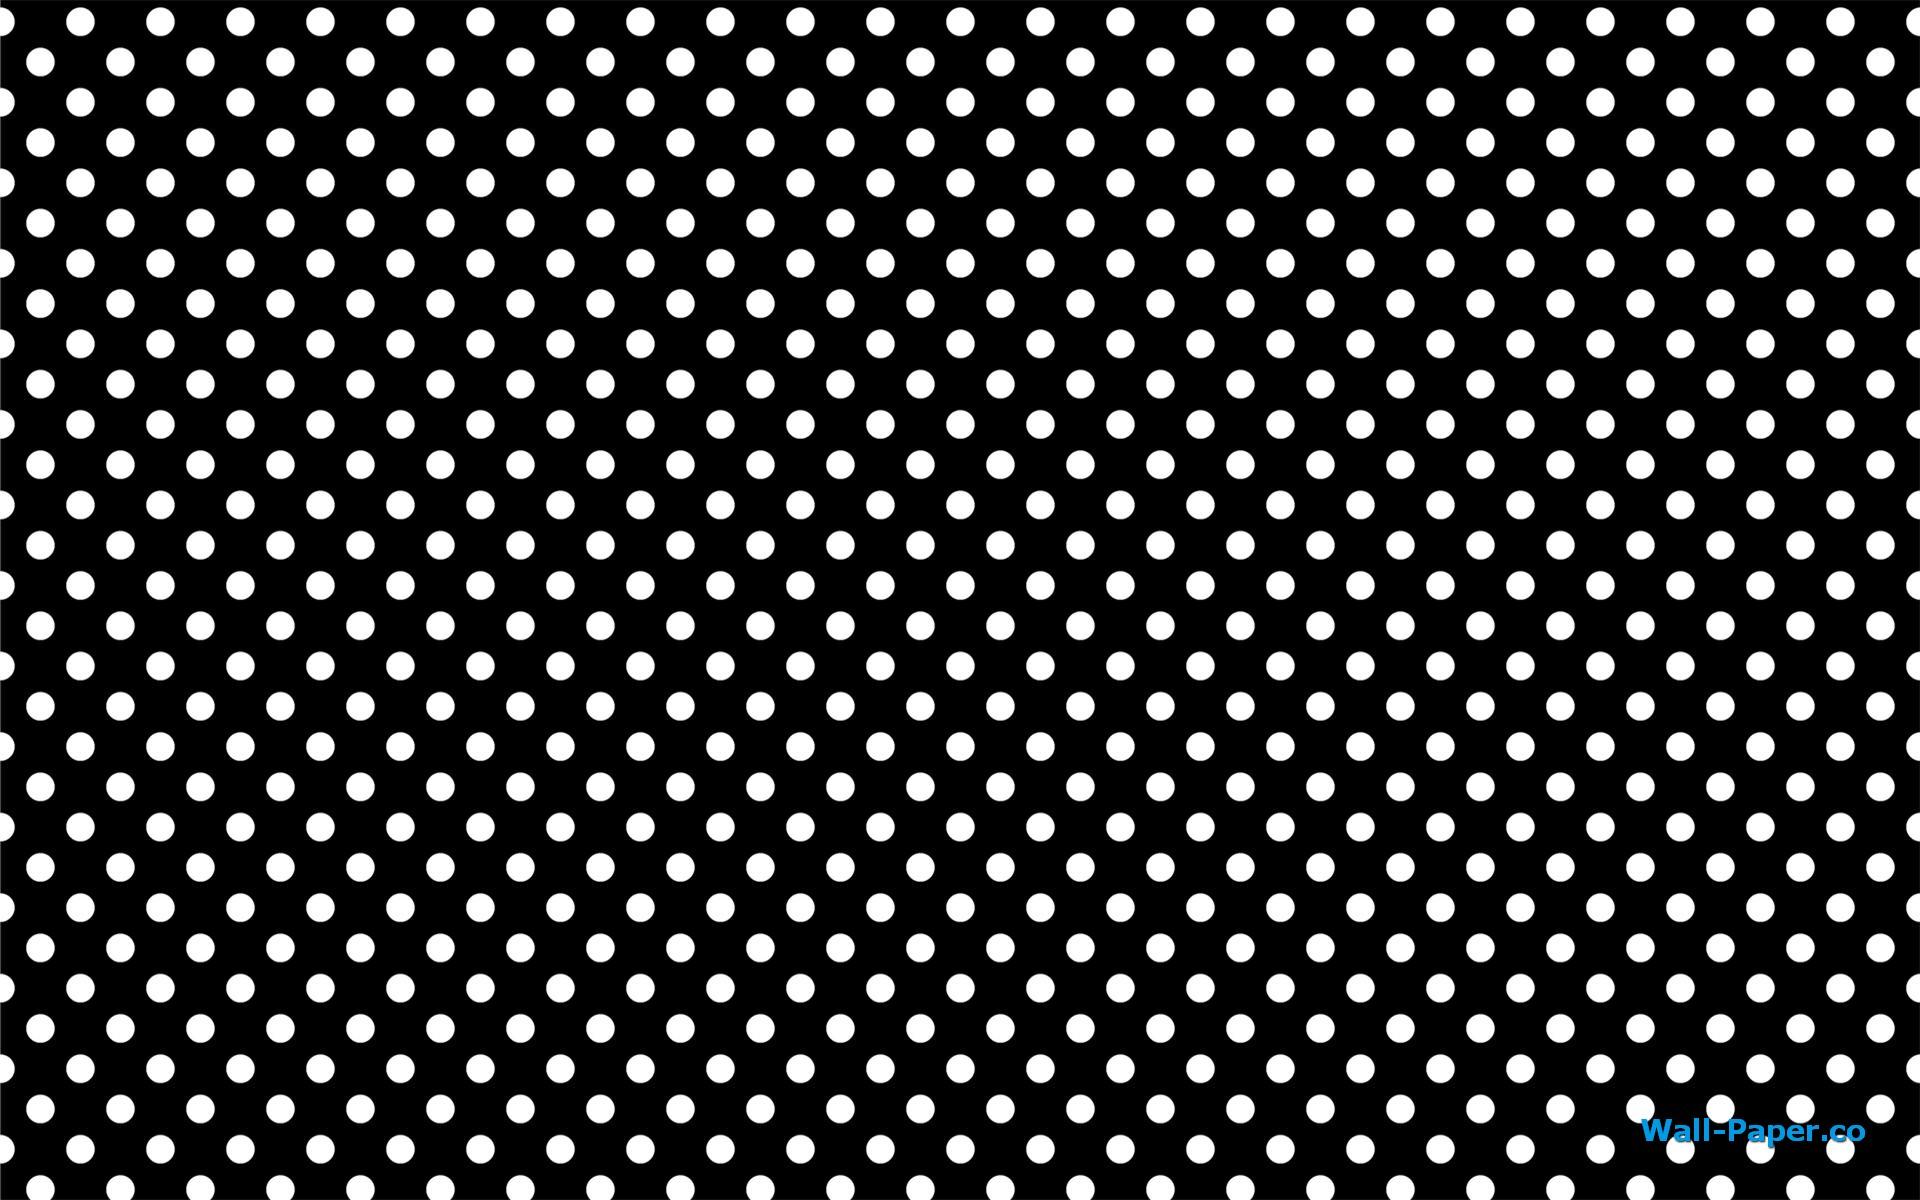 47 Dots Wallpaper On Wallpapersafari